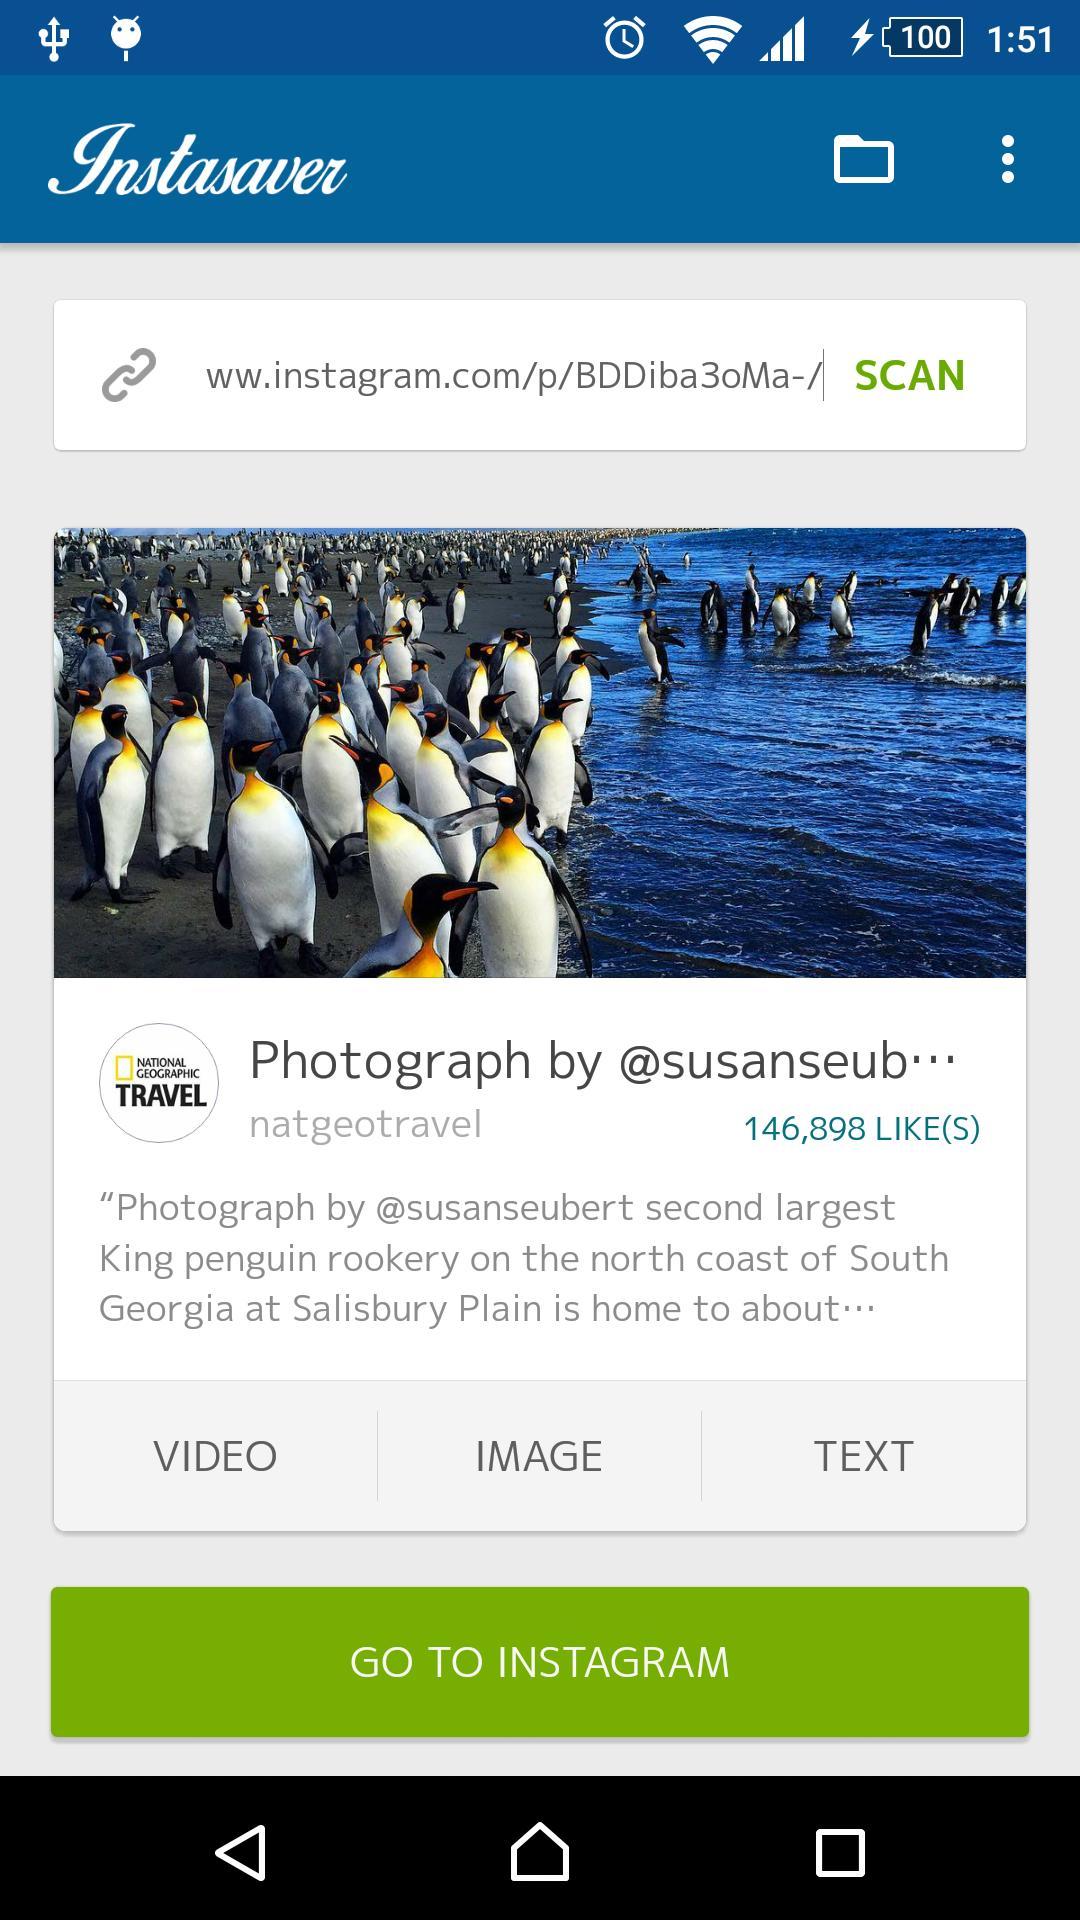 Instasaver for Instagram for Android - APK Download